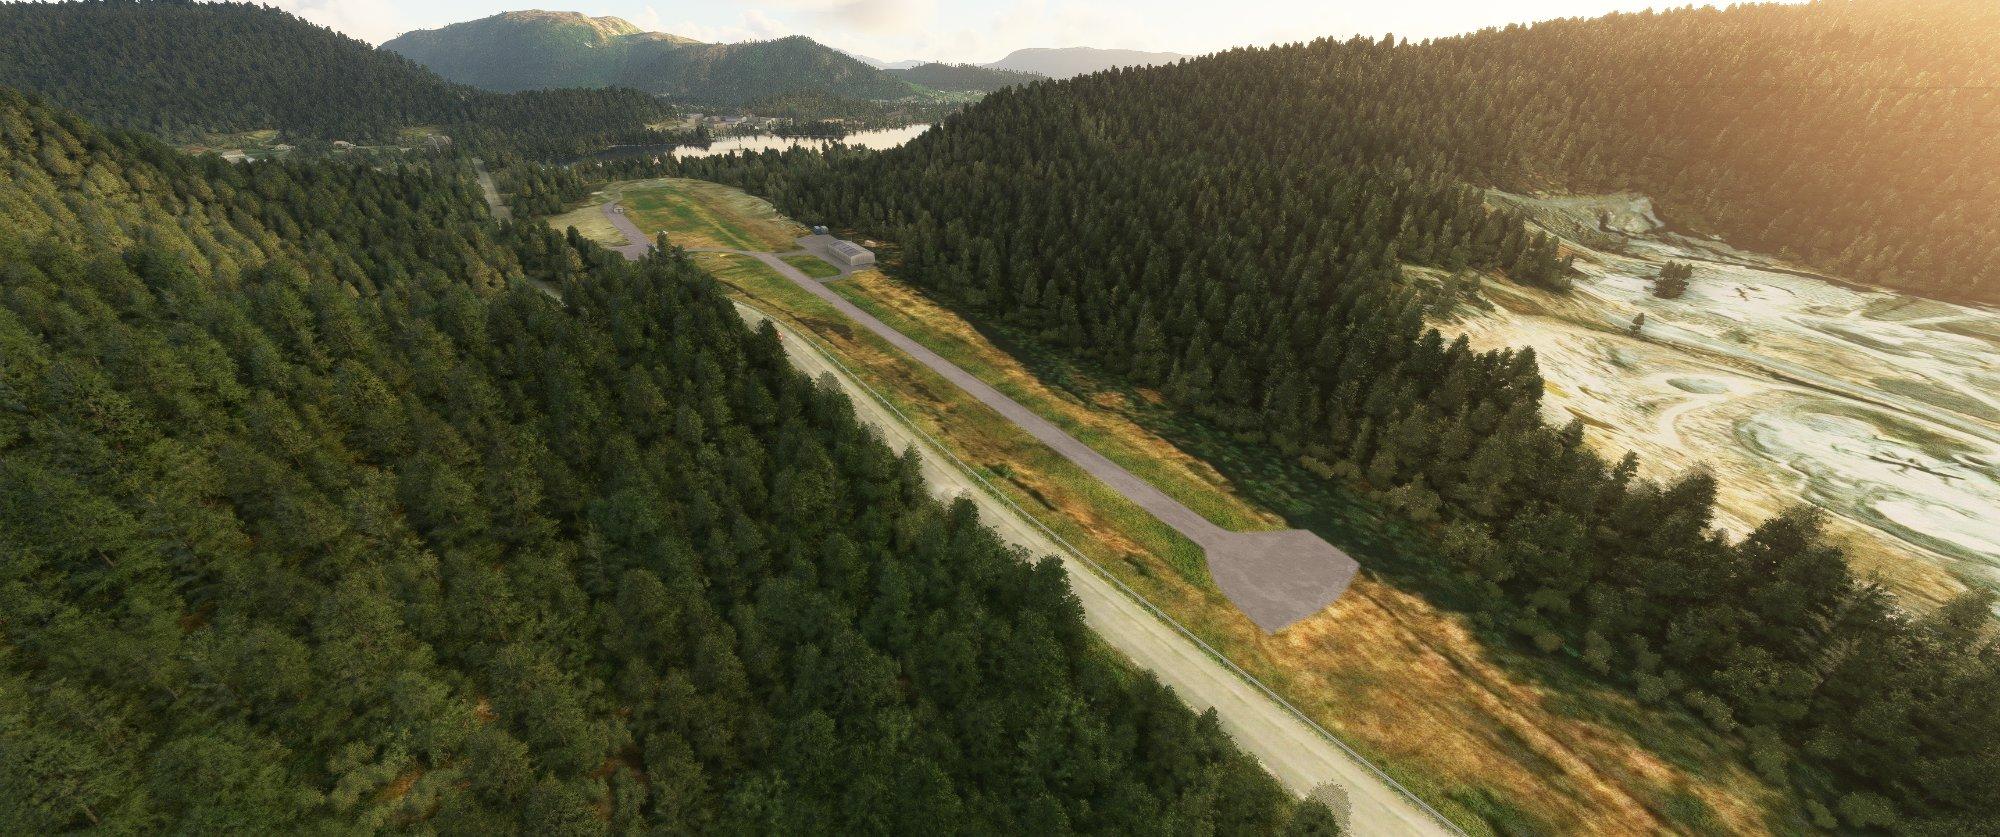 Microsoft Flight Simulator Screenshot 2020.11.09 - 17.33.56.10.jpg